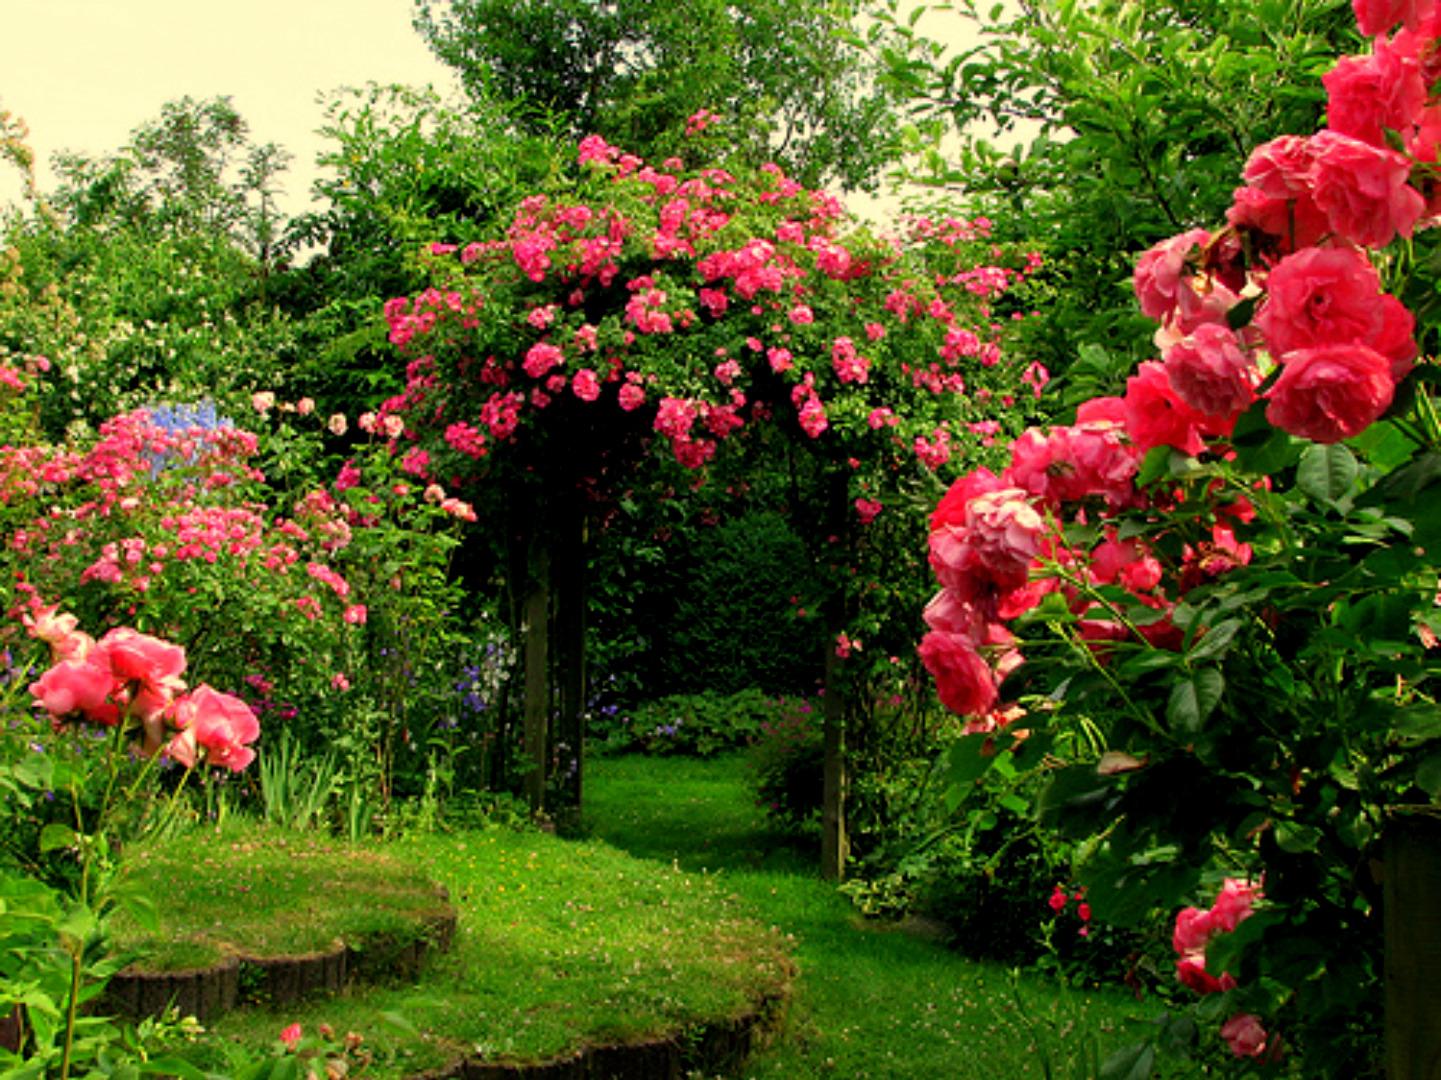 Flower garden wallpaper background - Rose Garden Wallpaper Rose Garden Photos Cool Wallpapers